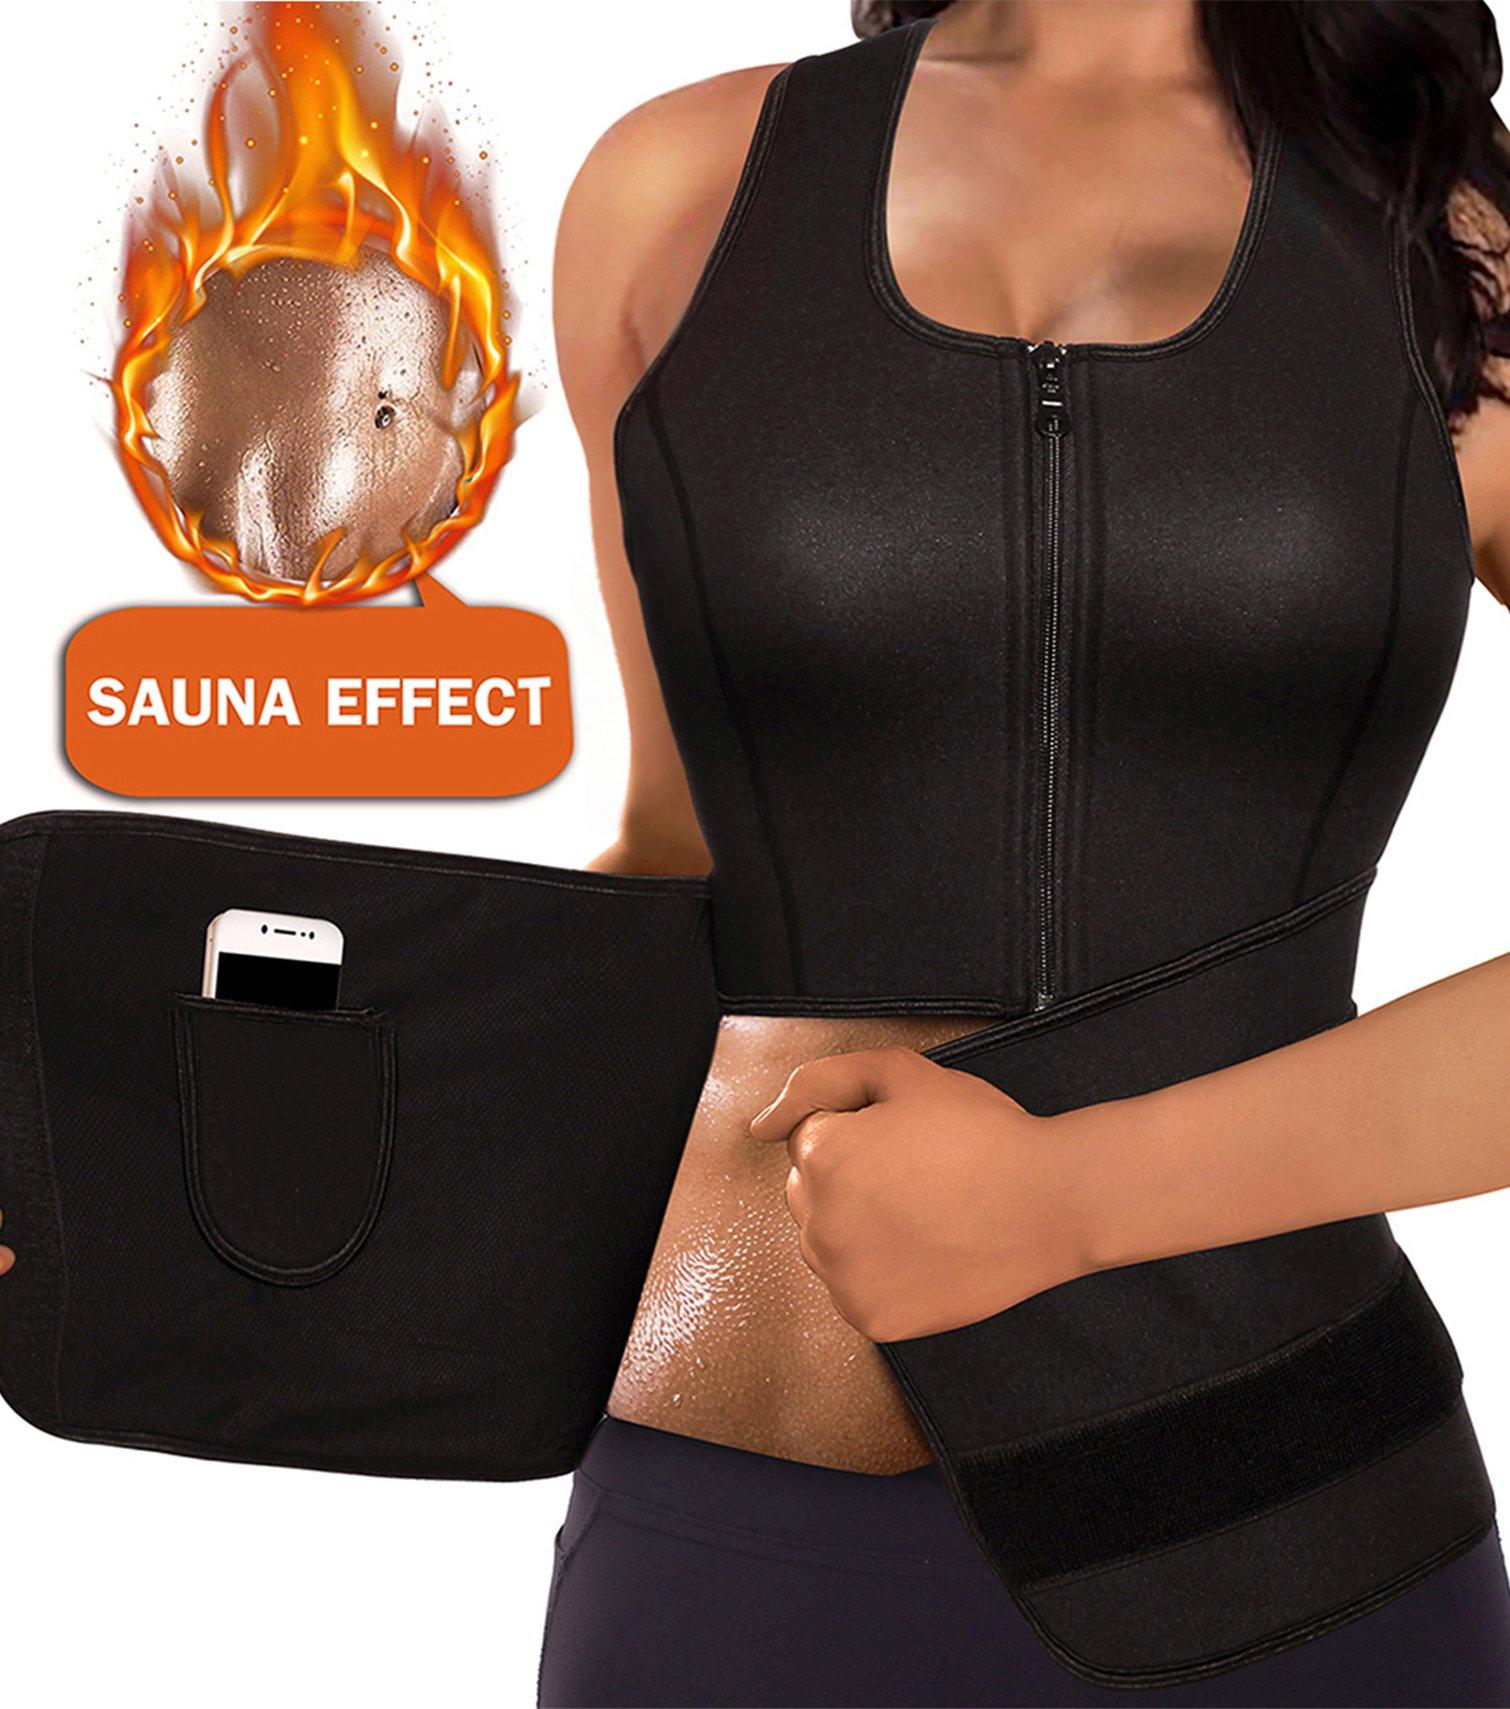 91b3b22eecf6b LODAY Women Neoprene Body Shaper Sauna Suit Gym Workout Tank Top Vest with  Adjustable Waist Trainer Trimmer Belt (Black(Zipper Sweat Shirts)